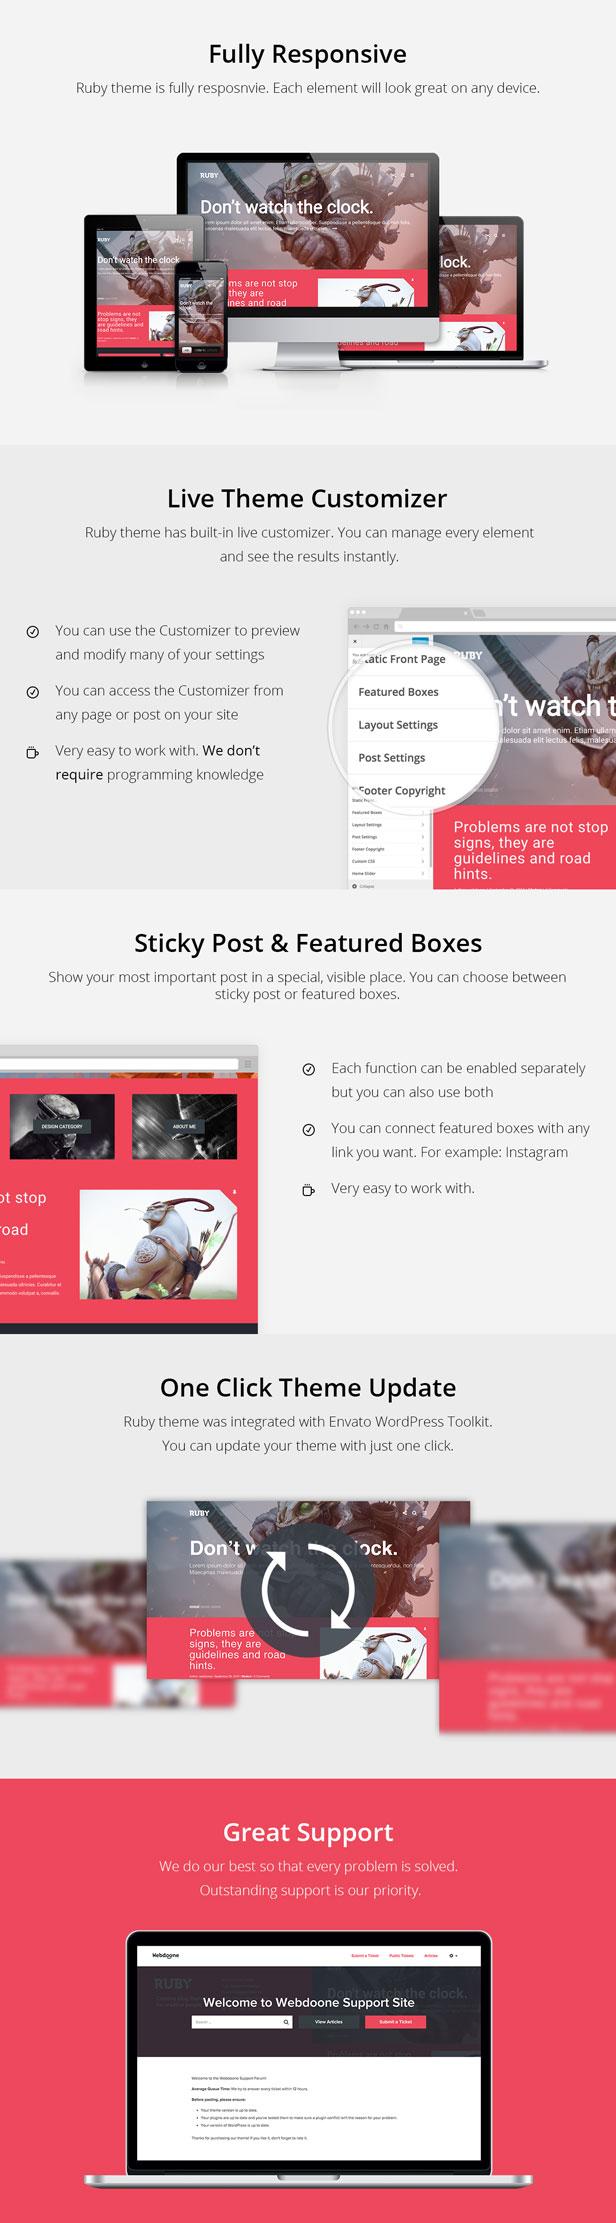 Ruby Theme - A Creative WordPress Blog Theme - 3